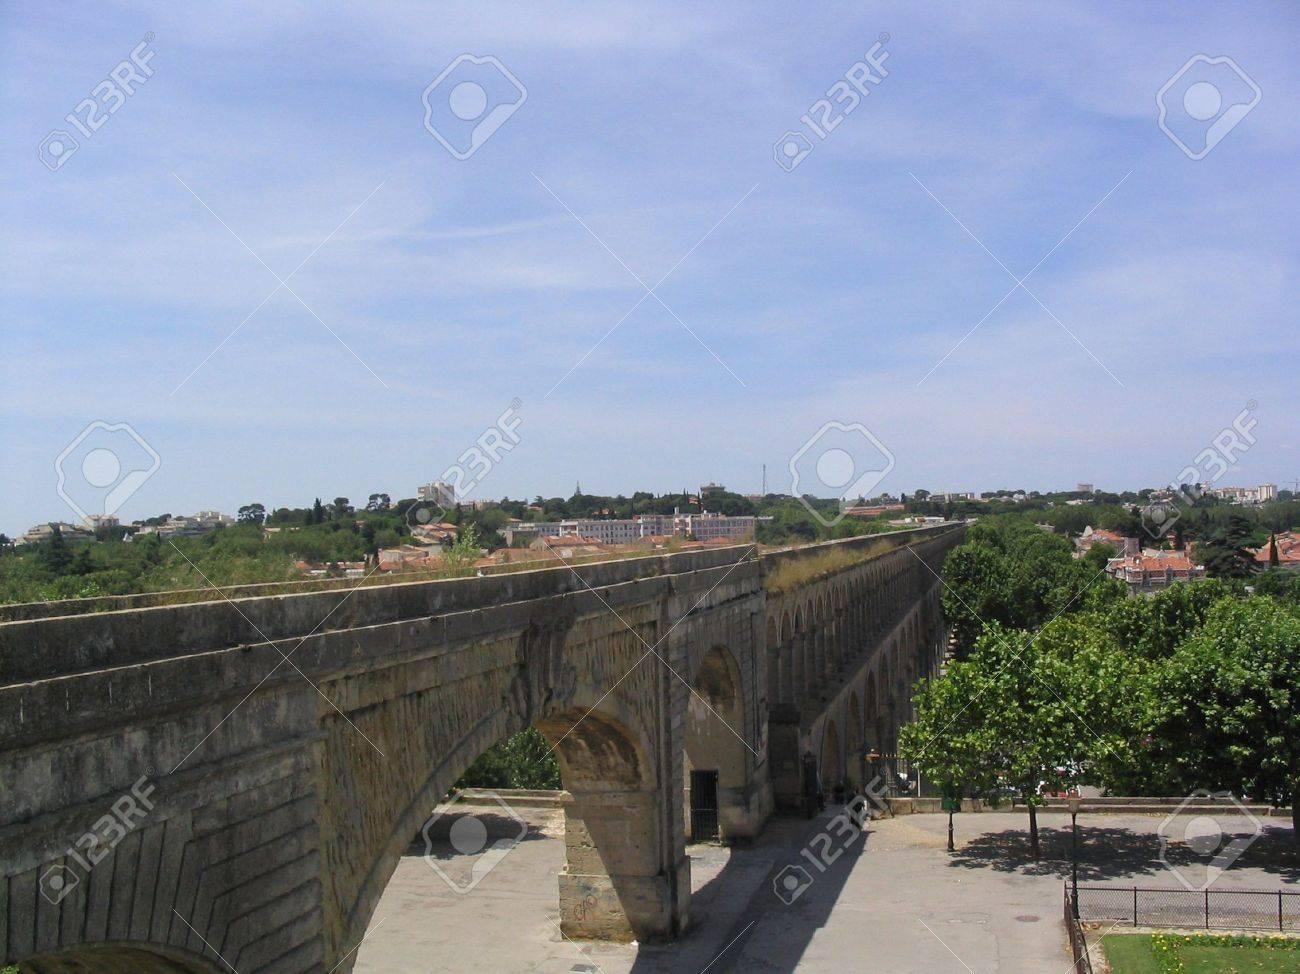 Roman aqueduct in Montpellier France - 4589374